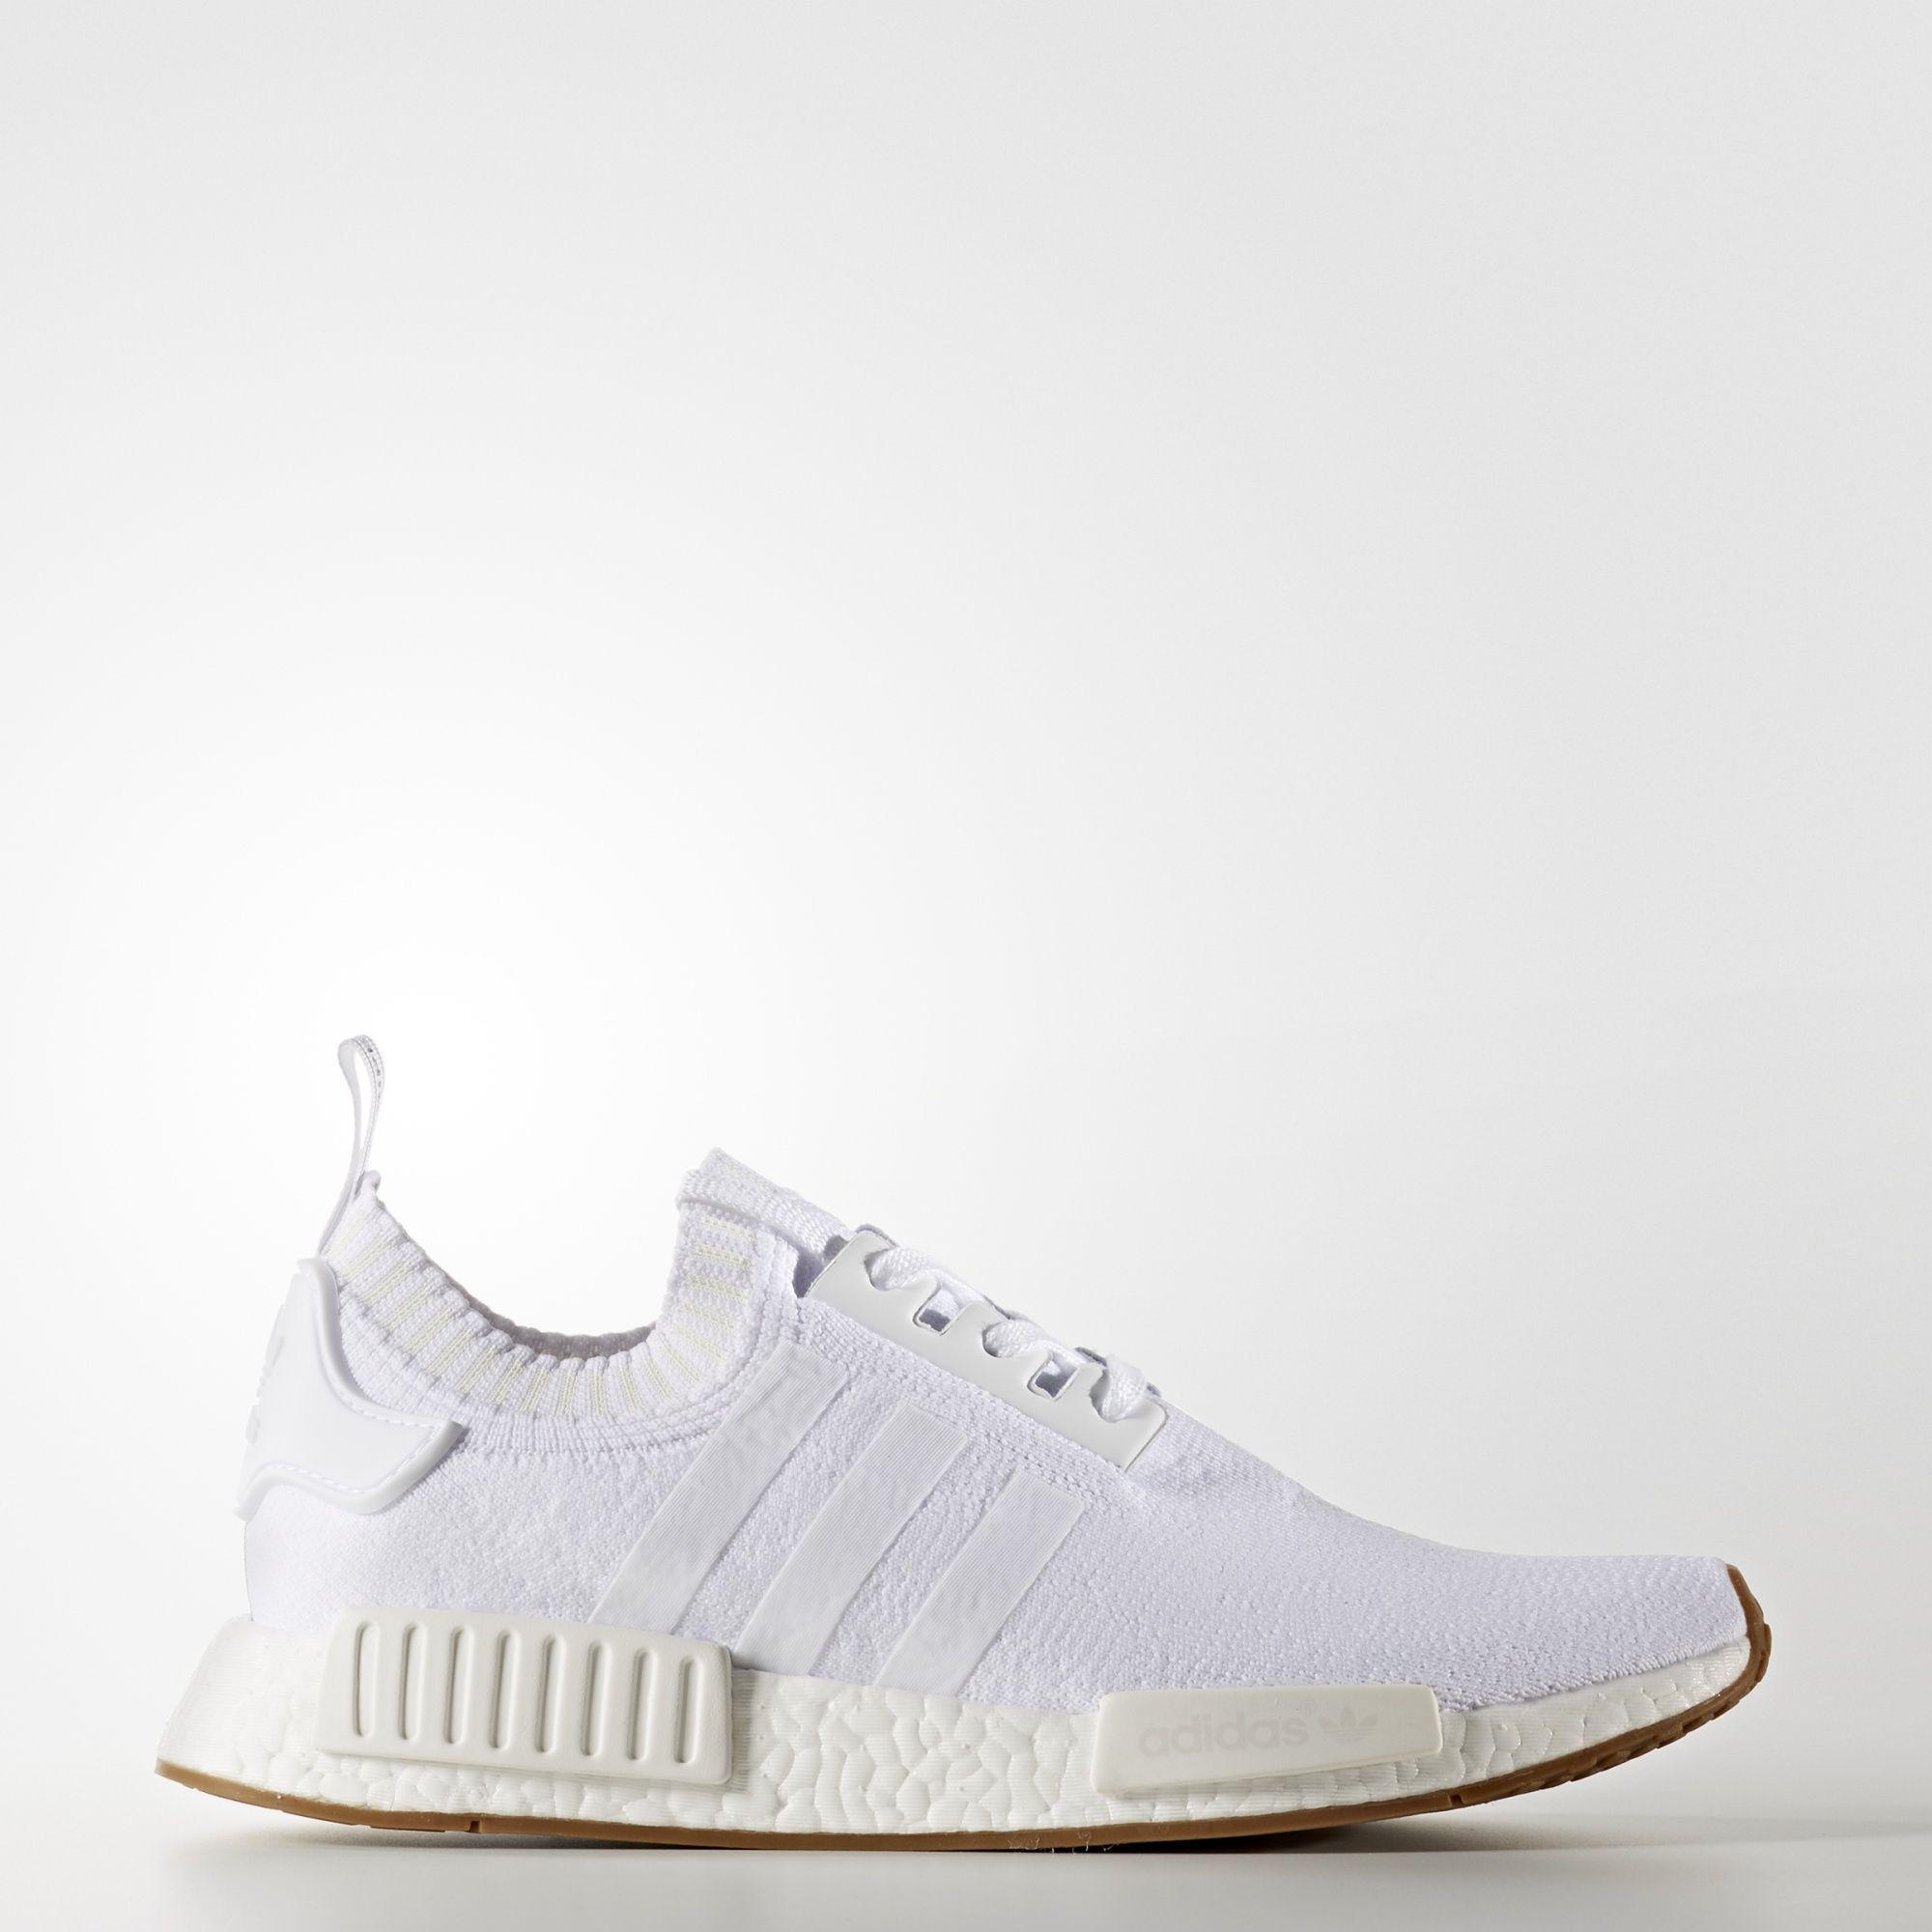 Nike Chaussures Adidas Nmd_r1 De Primeknit